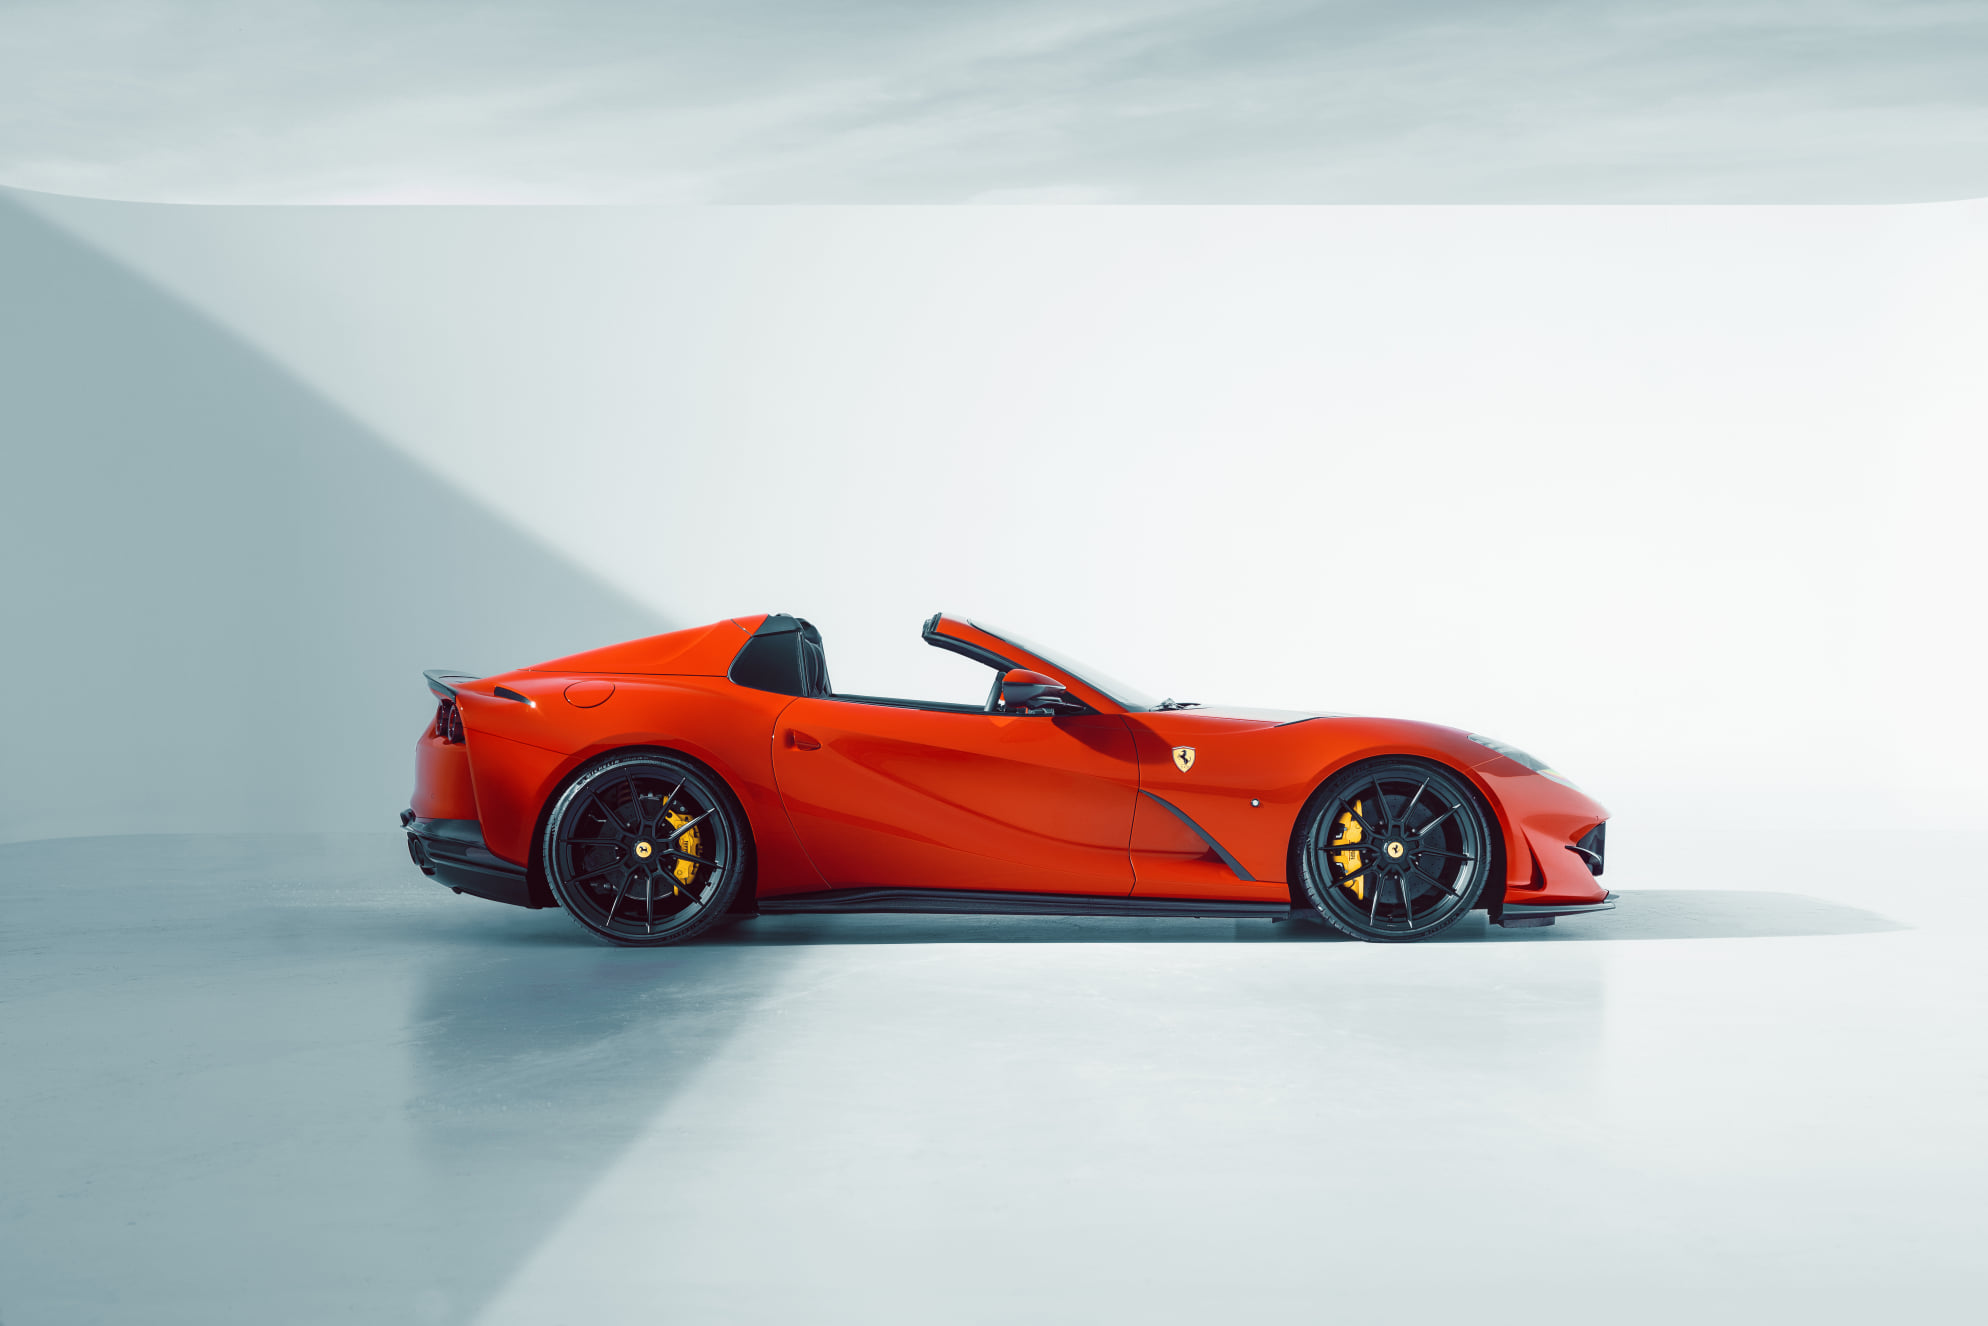 Ferrari-812-GTS-by-Novitec-11